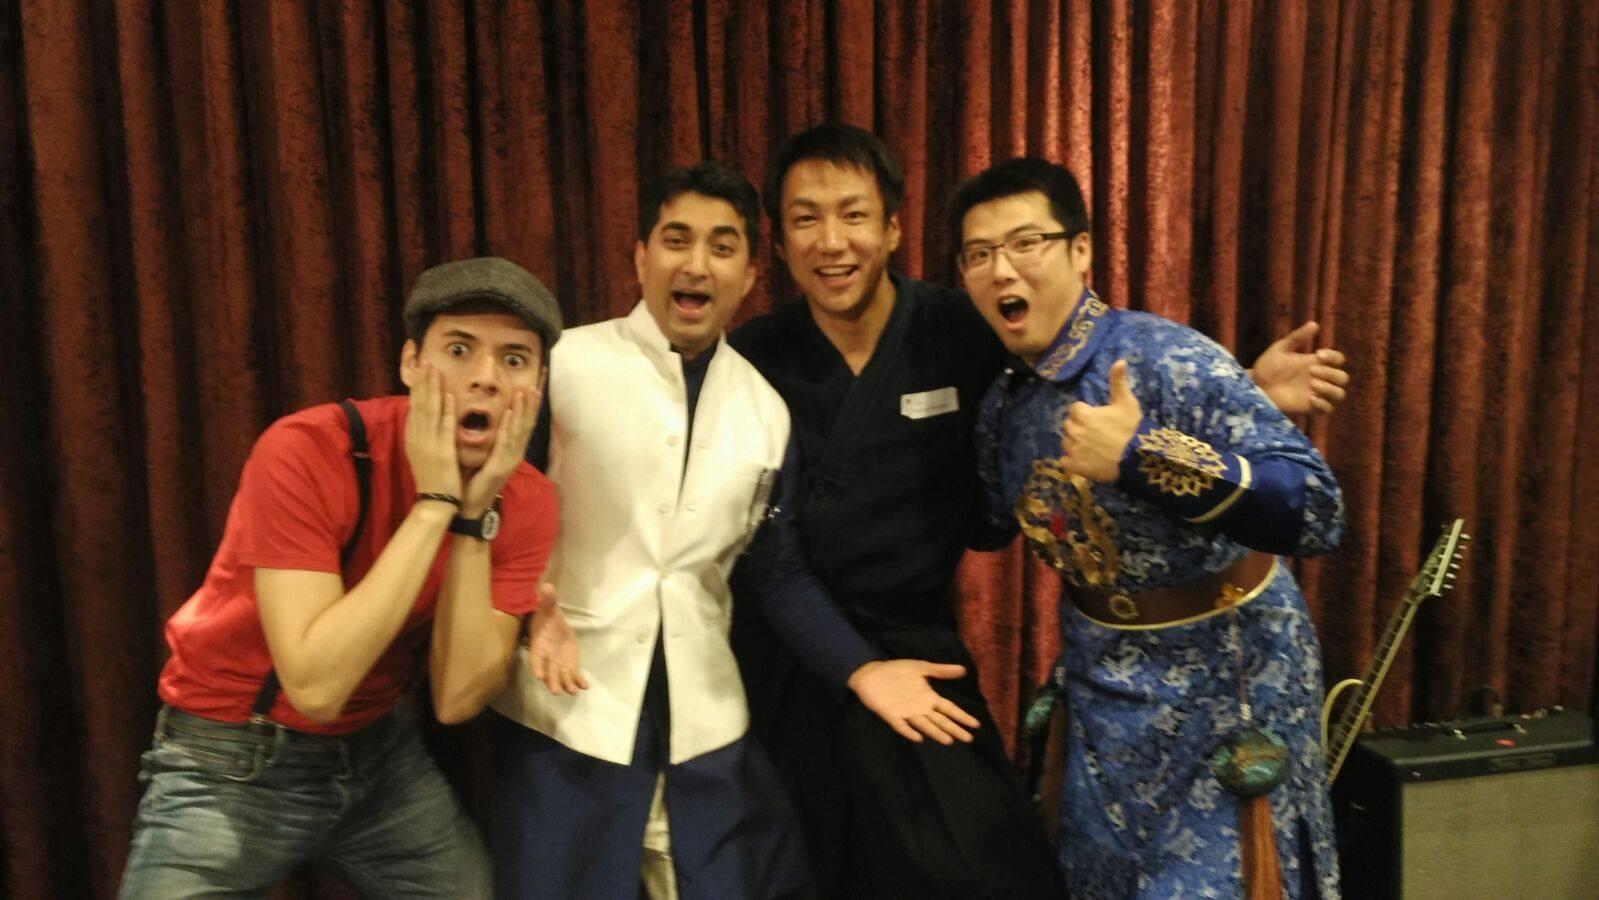 Zen and his flatmates.